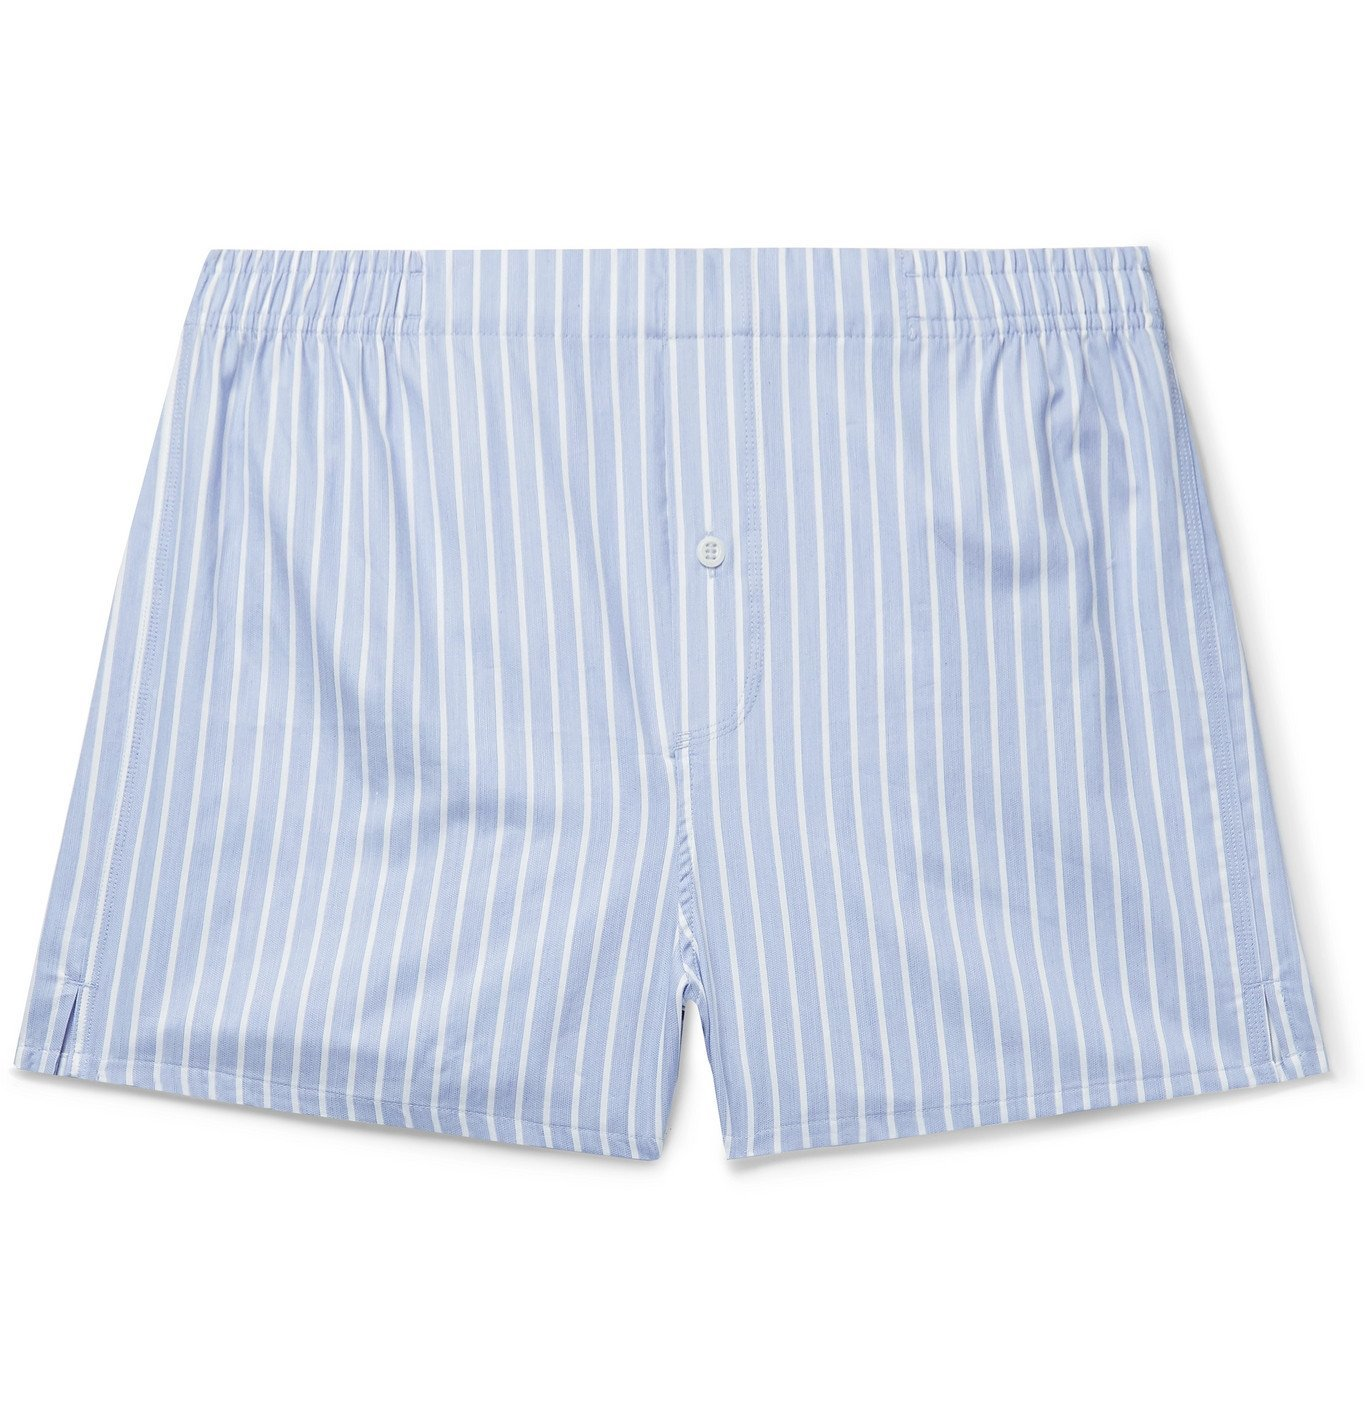 Photo: Hamilton and Hare - Striped Cotton Boxer Shorts - Blue